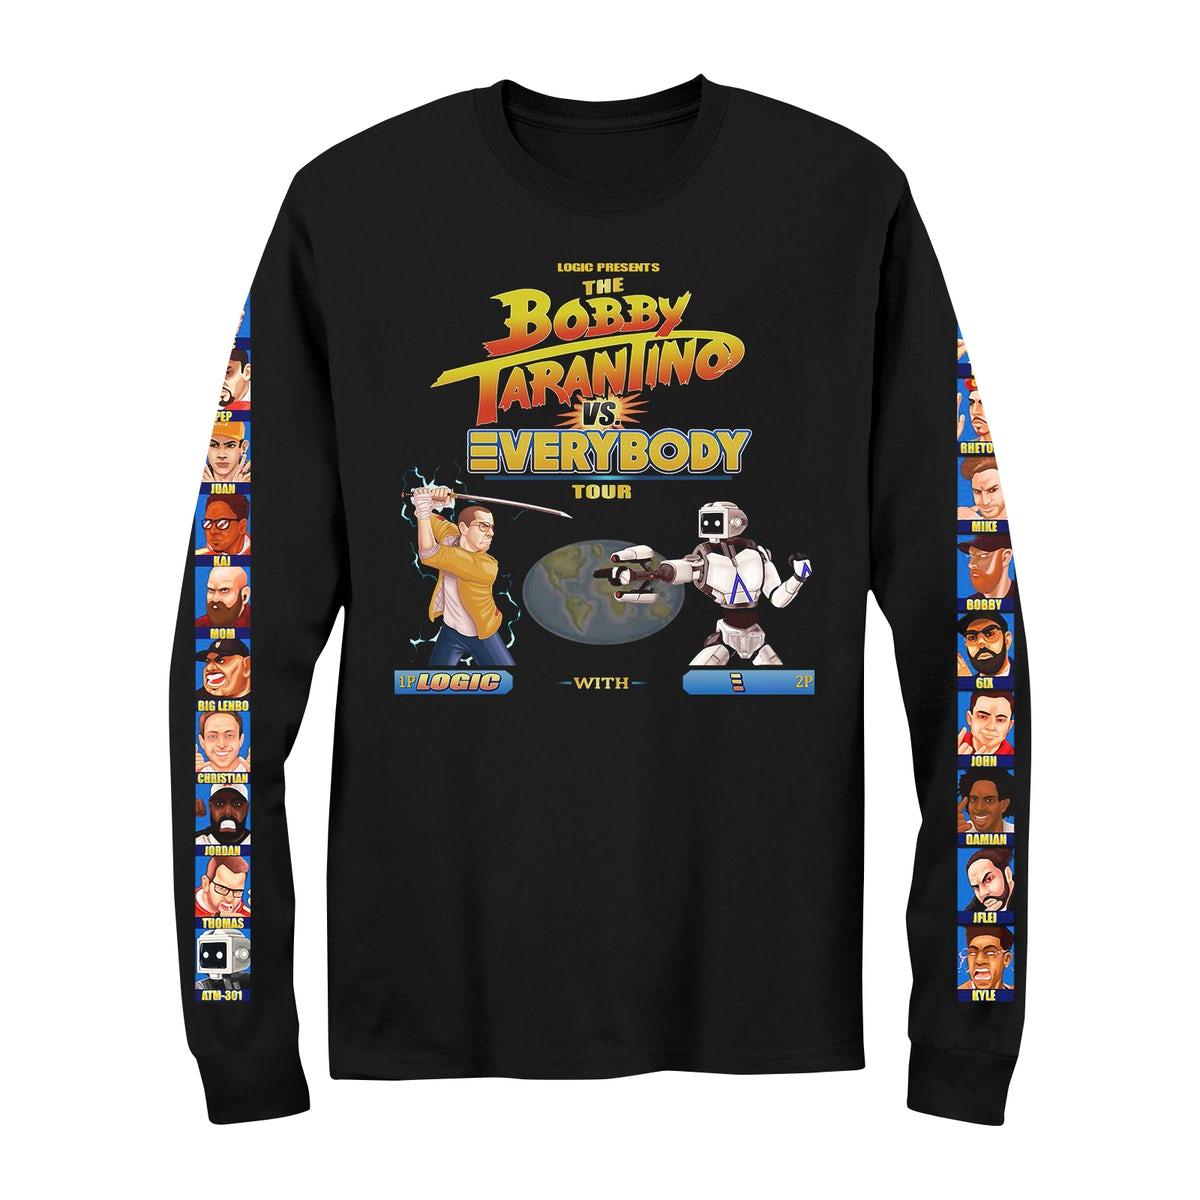 Logic PEACE LOVE /& POSITIVITY ROBOT BOBBY TARANTINO T-Shirt NEW